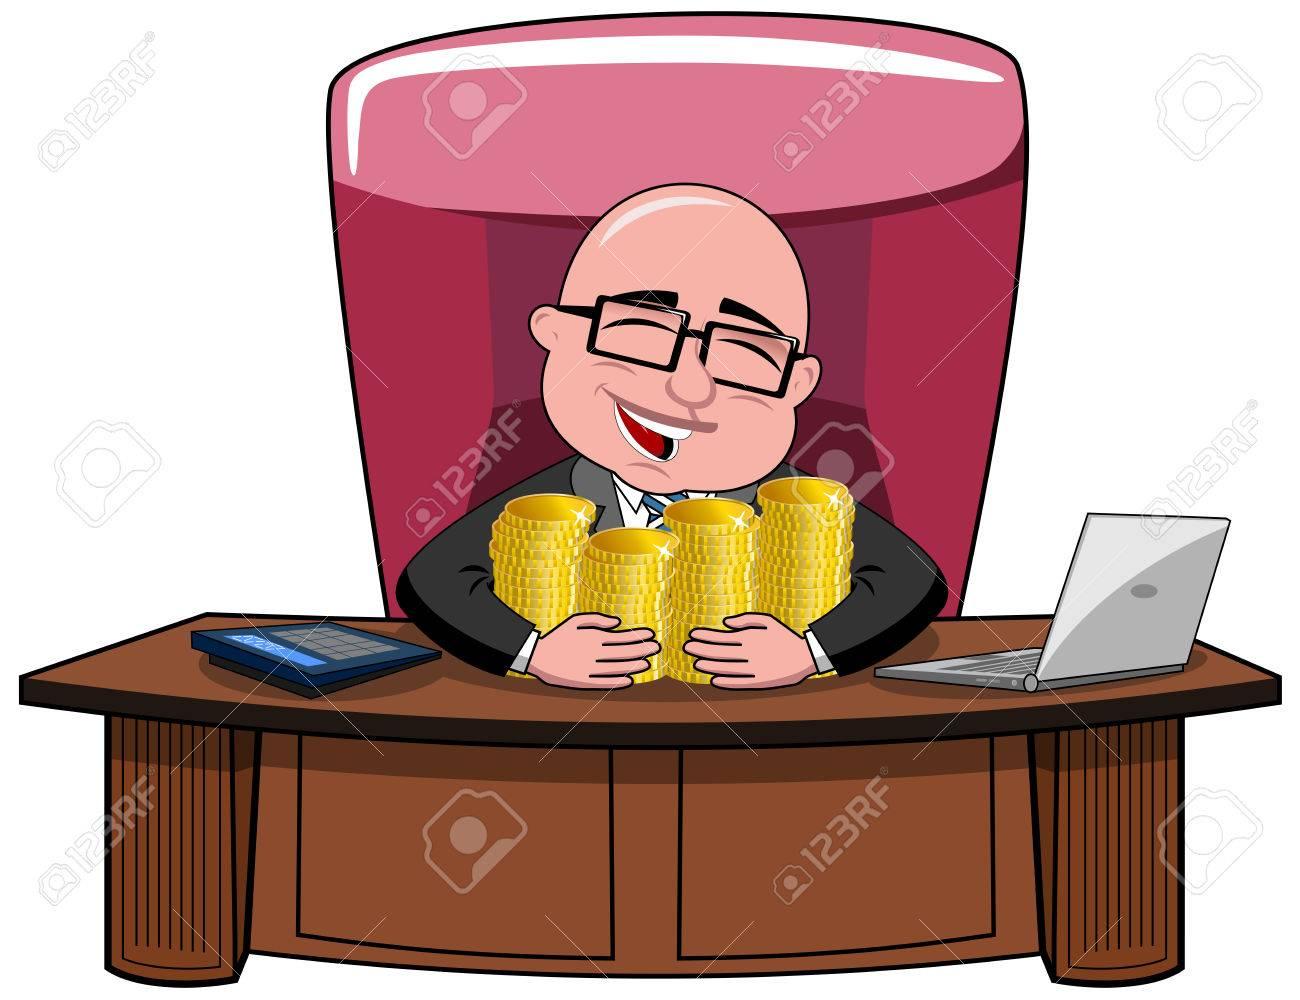 Happy bald cartoon businessman boss sitting at desk hugging money isolated - 44988281